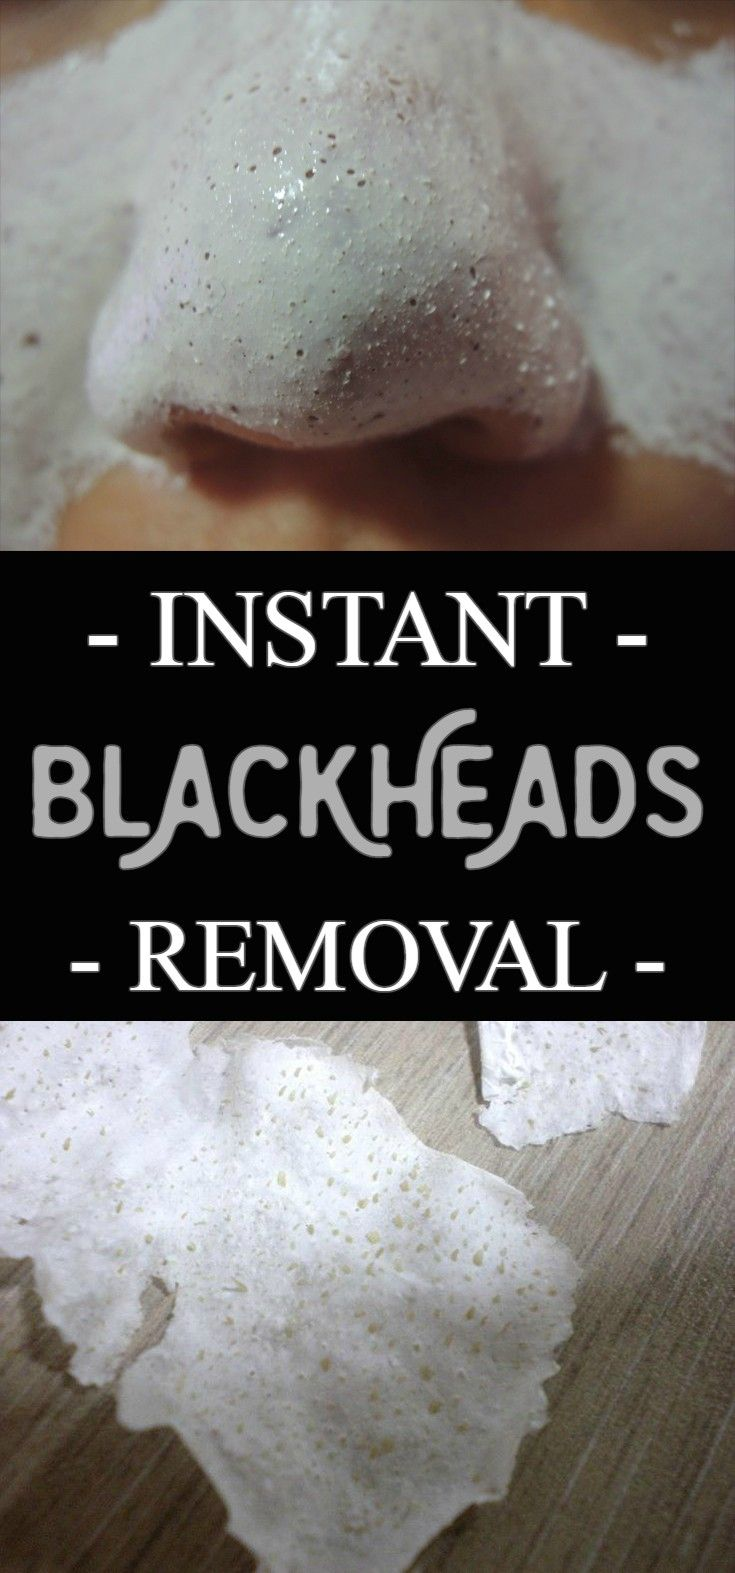 Instant blackheads removal   BestWomenTips com